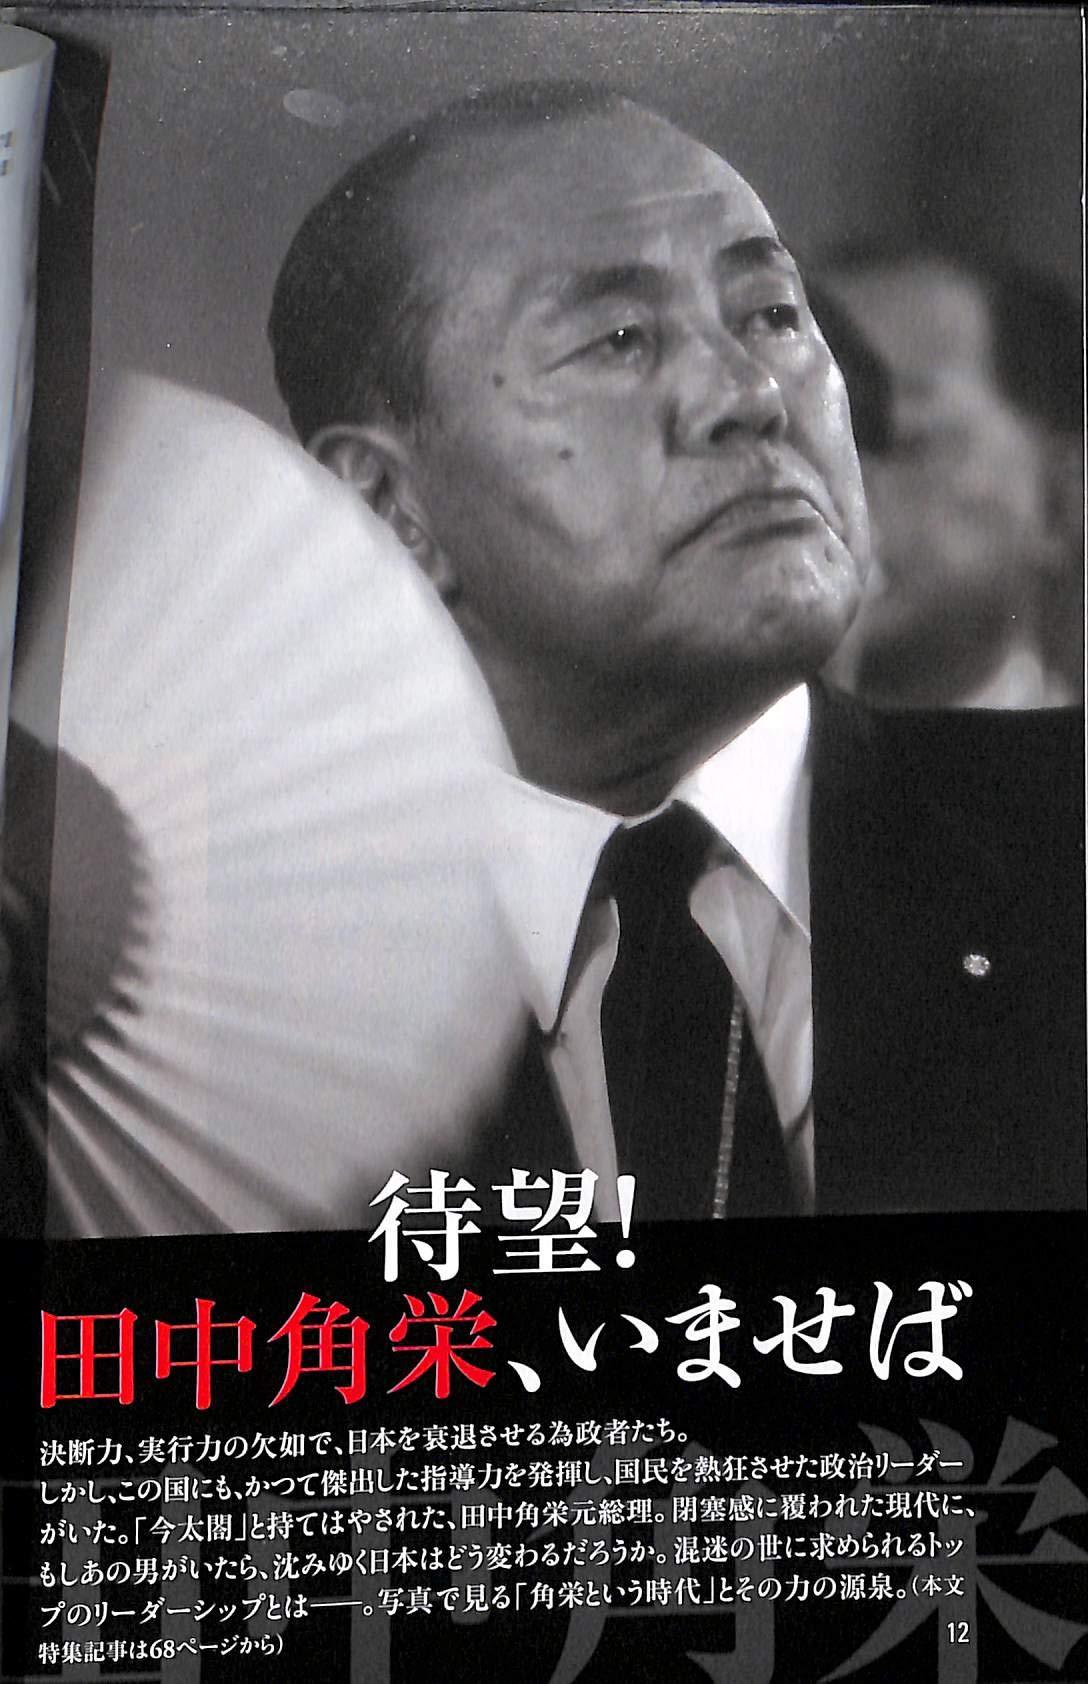 https://m.media-amazon.com/images/I/71L2cMHcK1L.jpg